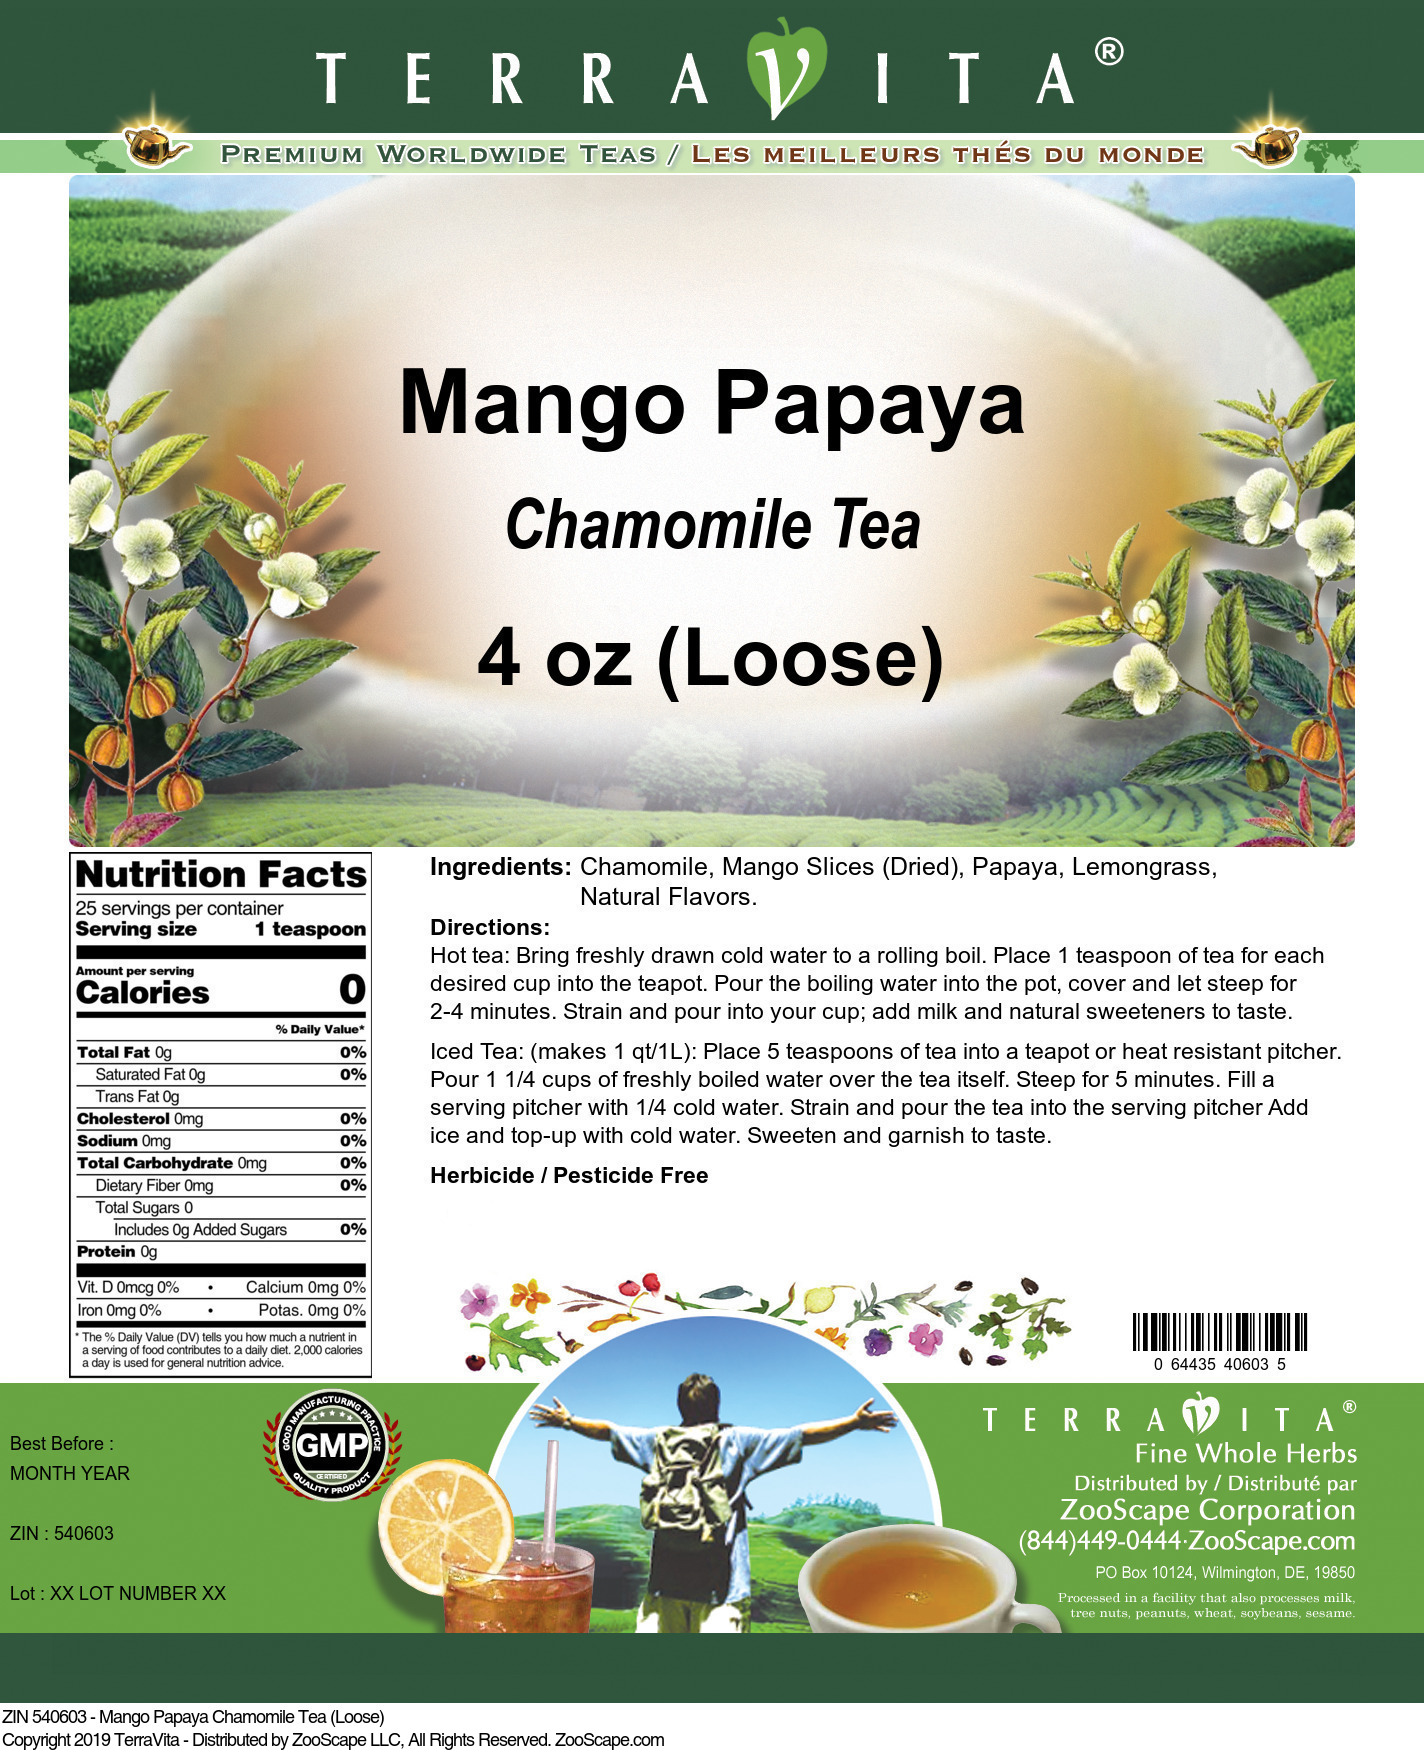 Mango Papaya Chamomile Tea